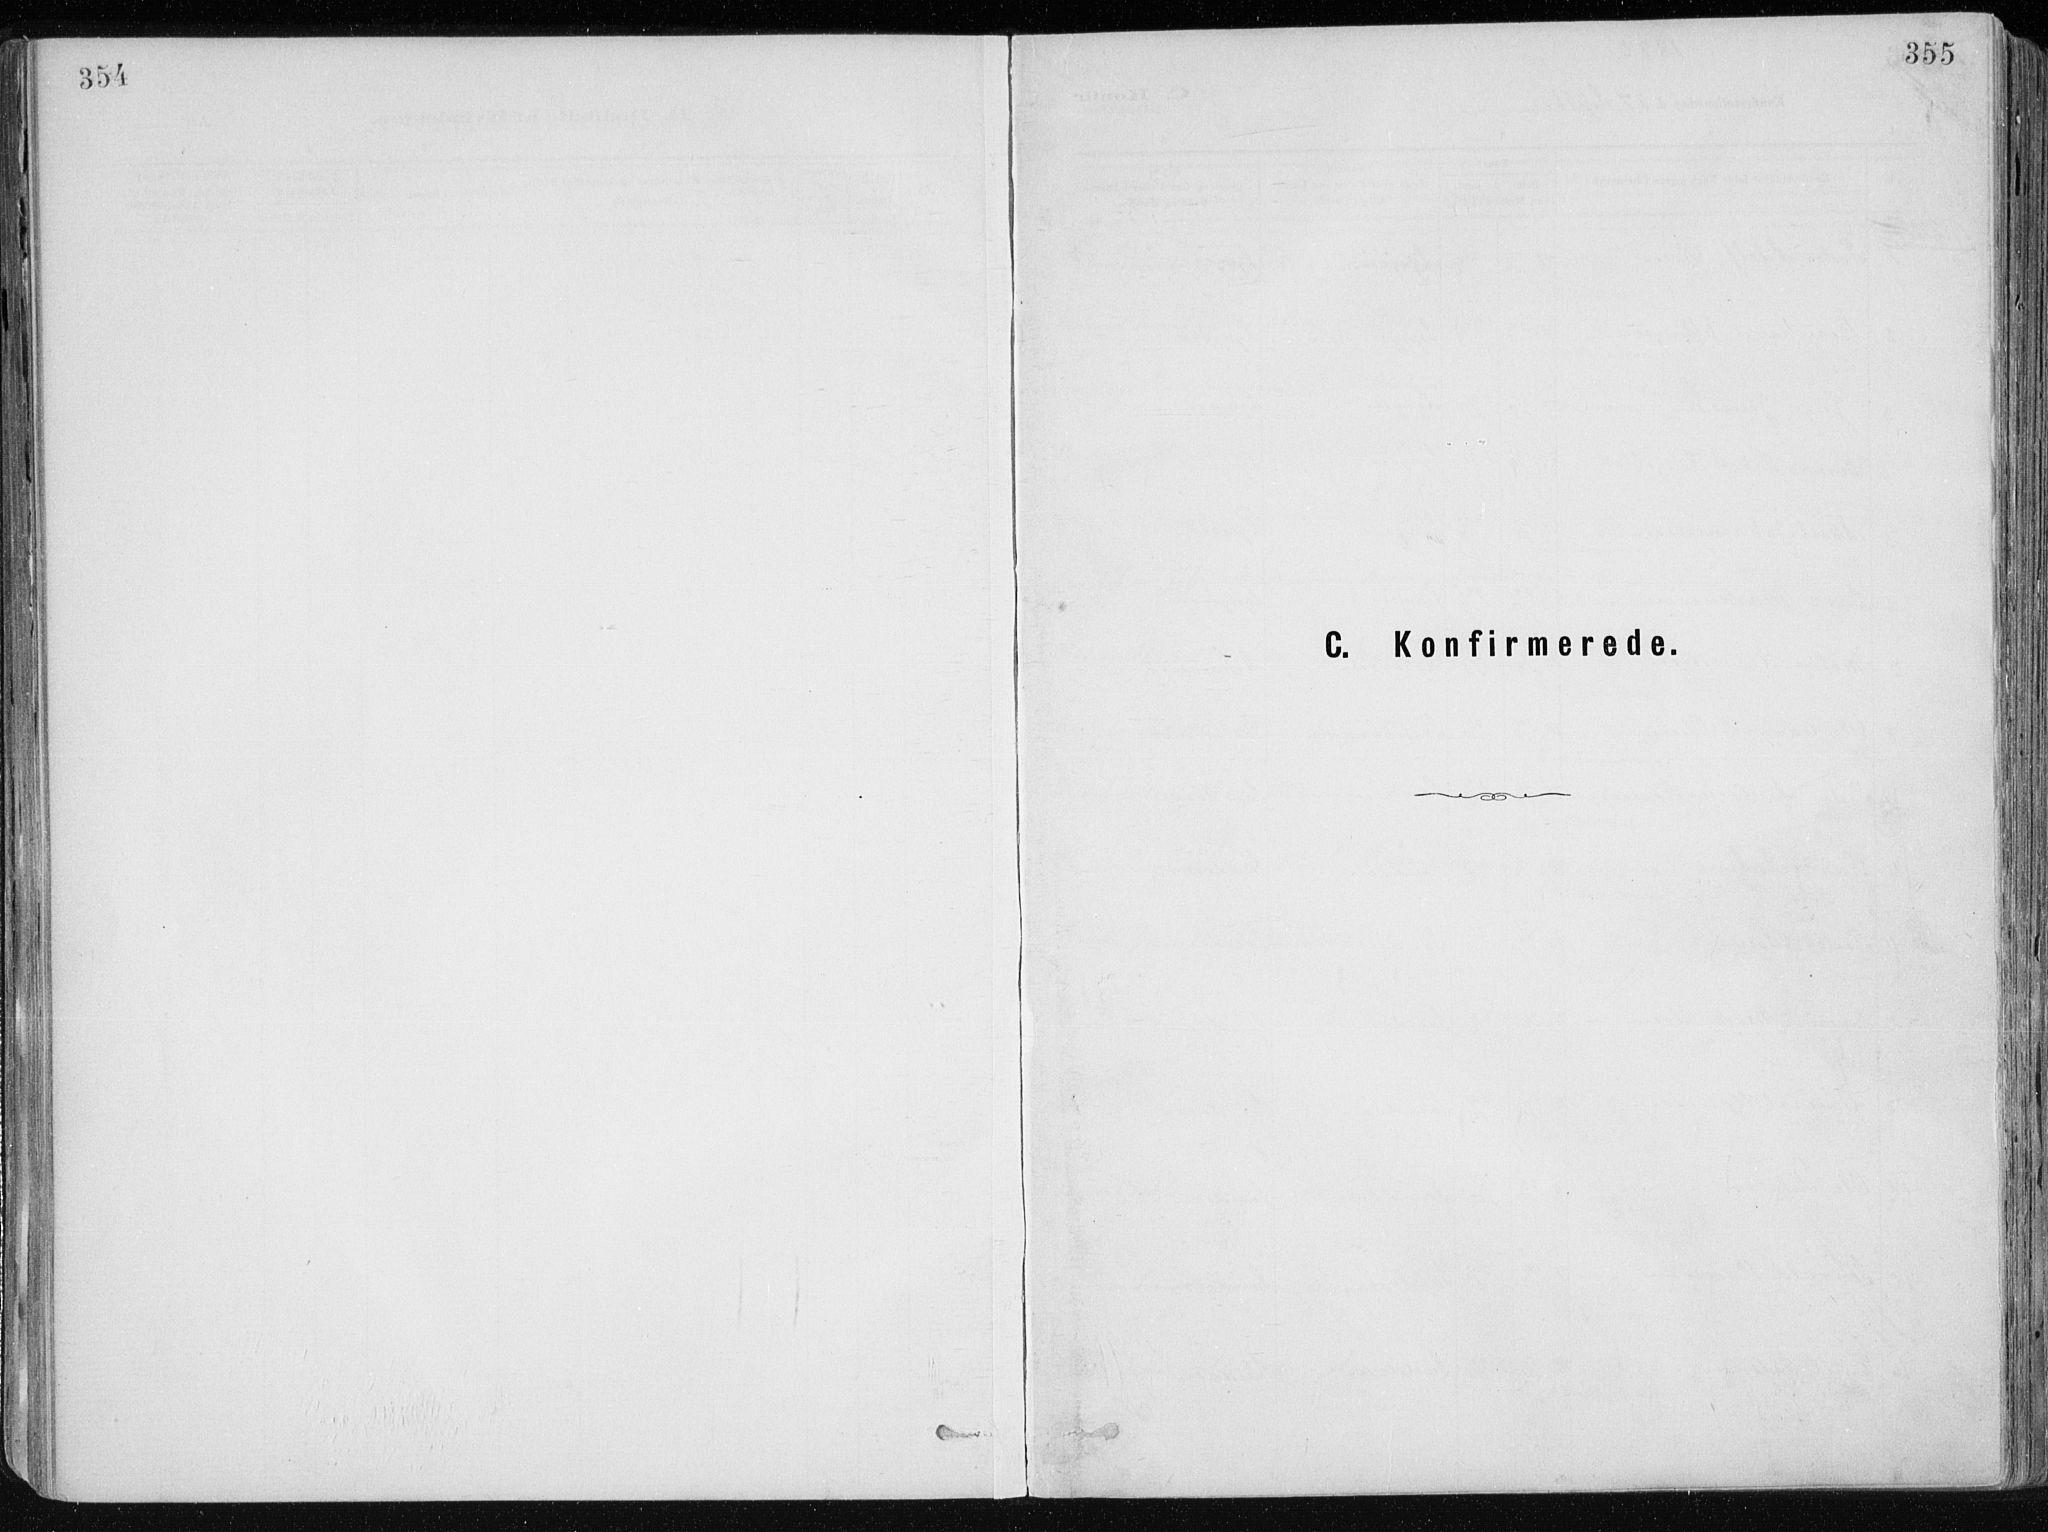 SAK, Dypvåg sokneprestkontor, F/Fa/Faa/L0008: Ministerialbok nr. A 8, 1885-1906, s. 354-355